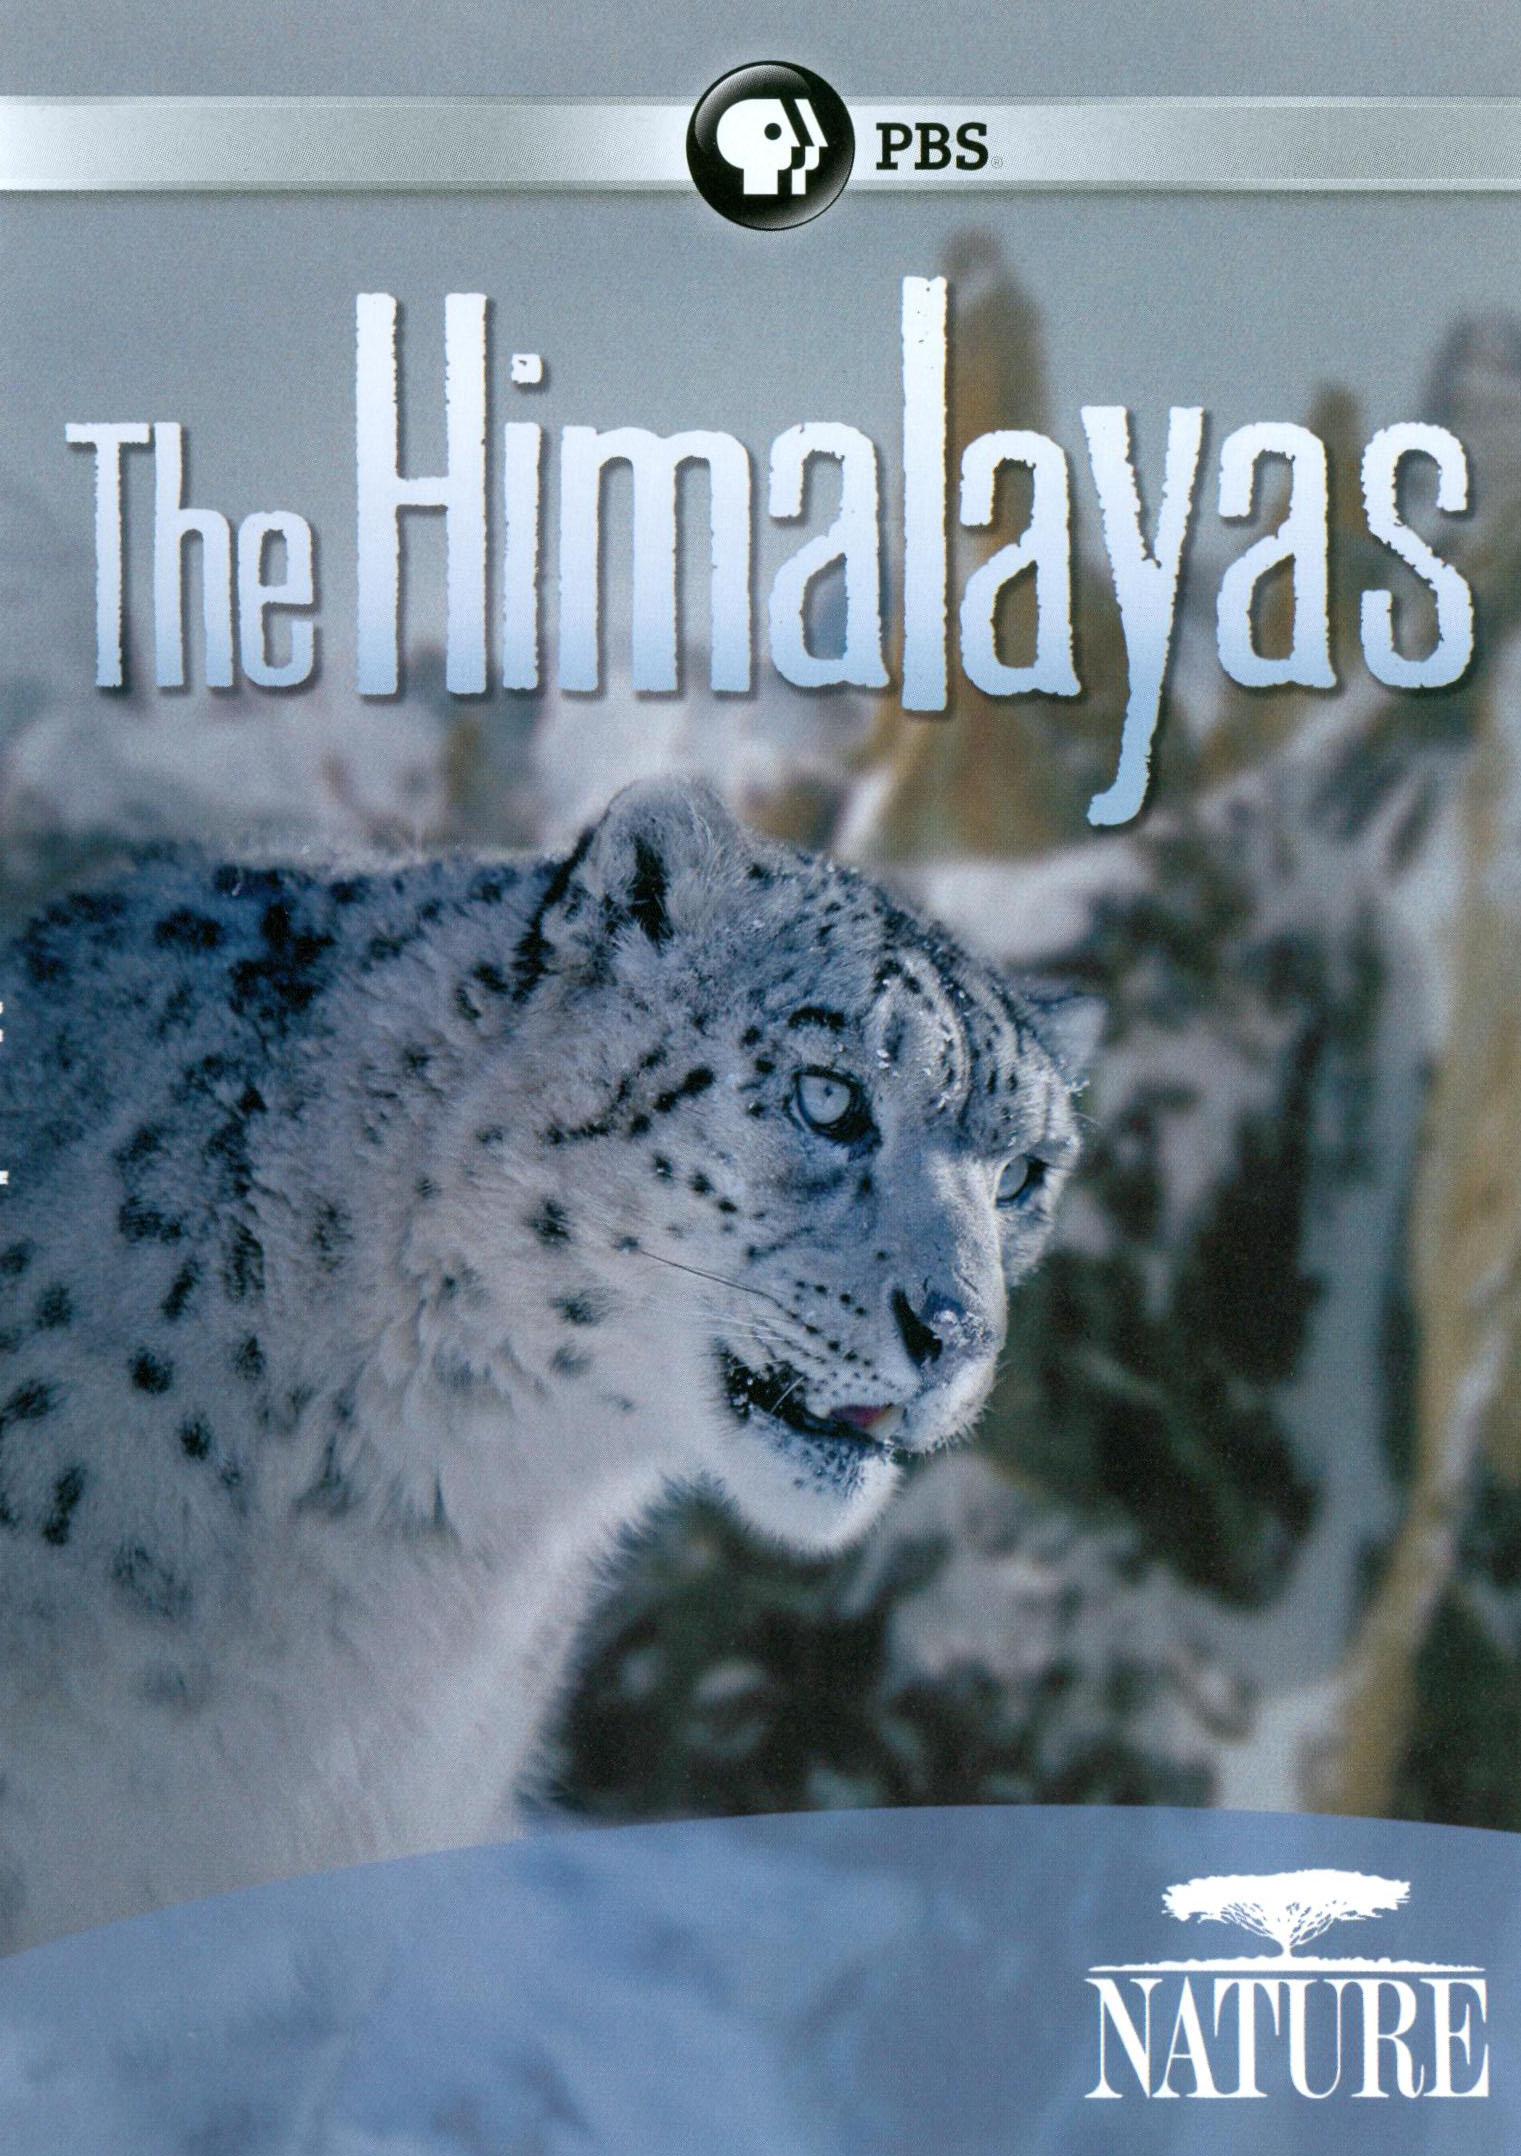 PBS纪录片《喜马拉雅山脉.The Himalayas.2011》